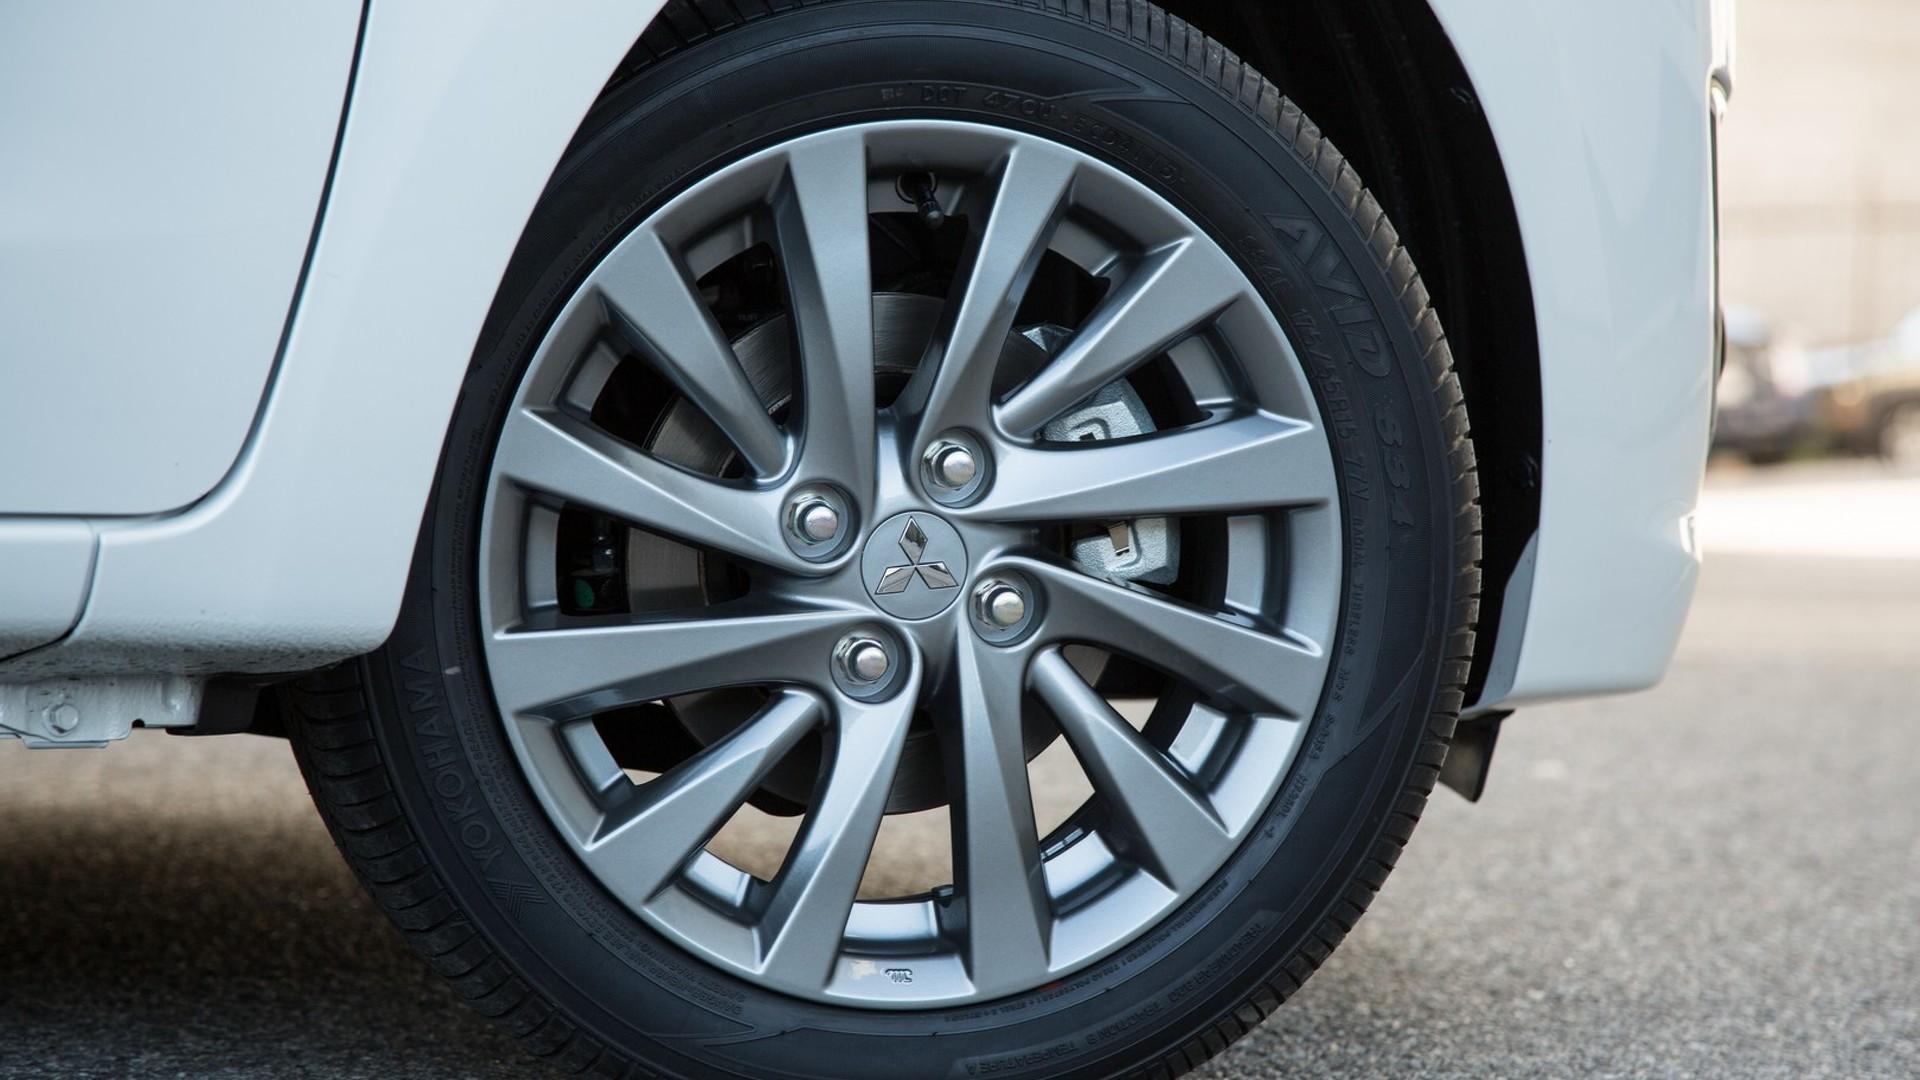 Mitsubishi ignored chance to fix fuel economy testing